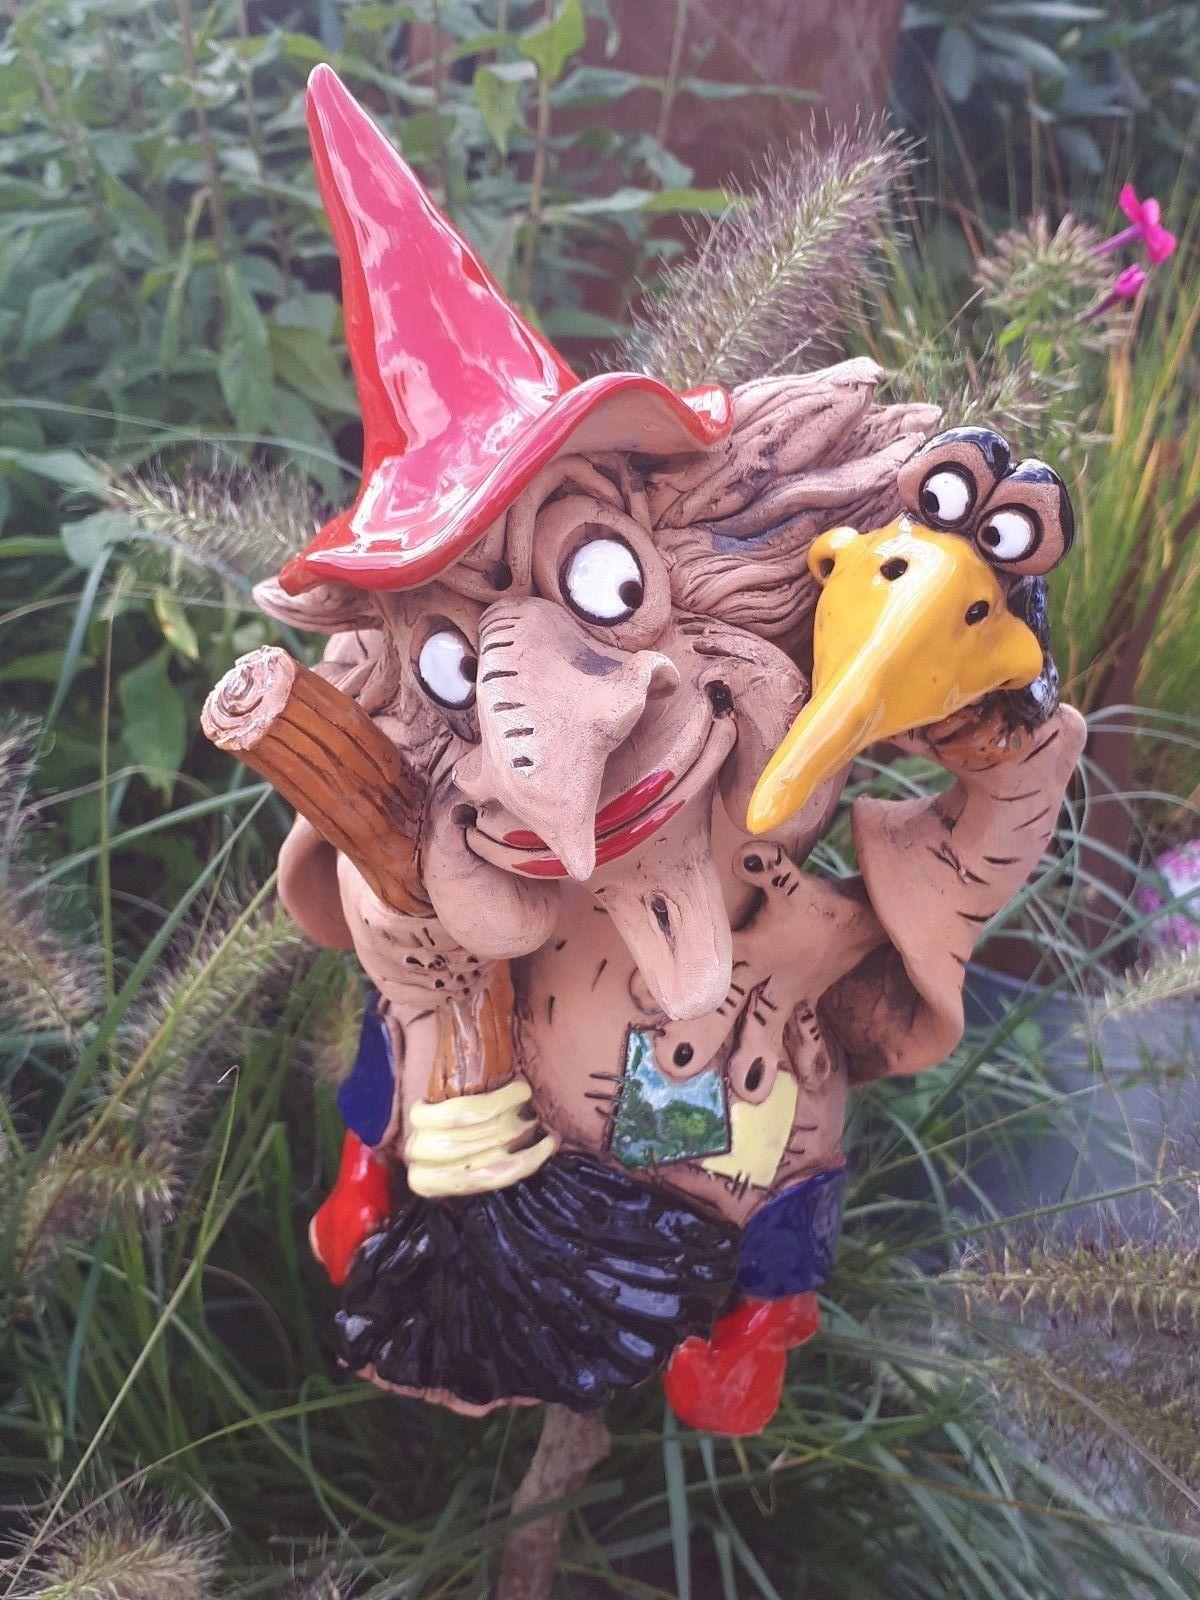 Keramik Hexe Mit Vogel Deko Garten Terrasse Beet Figur Handarbeit Skulptur Rabe Ebay Christmas Ornaments Holiday Decor Novelty Christmas